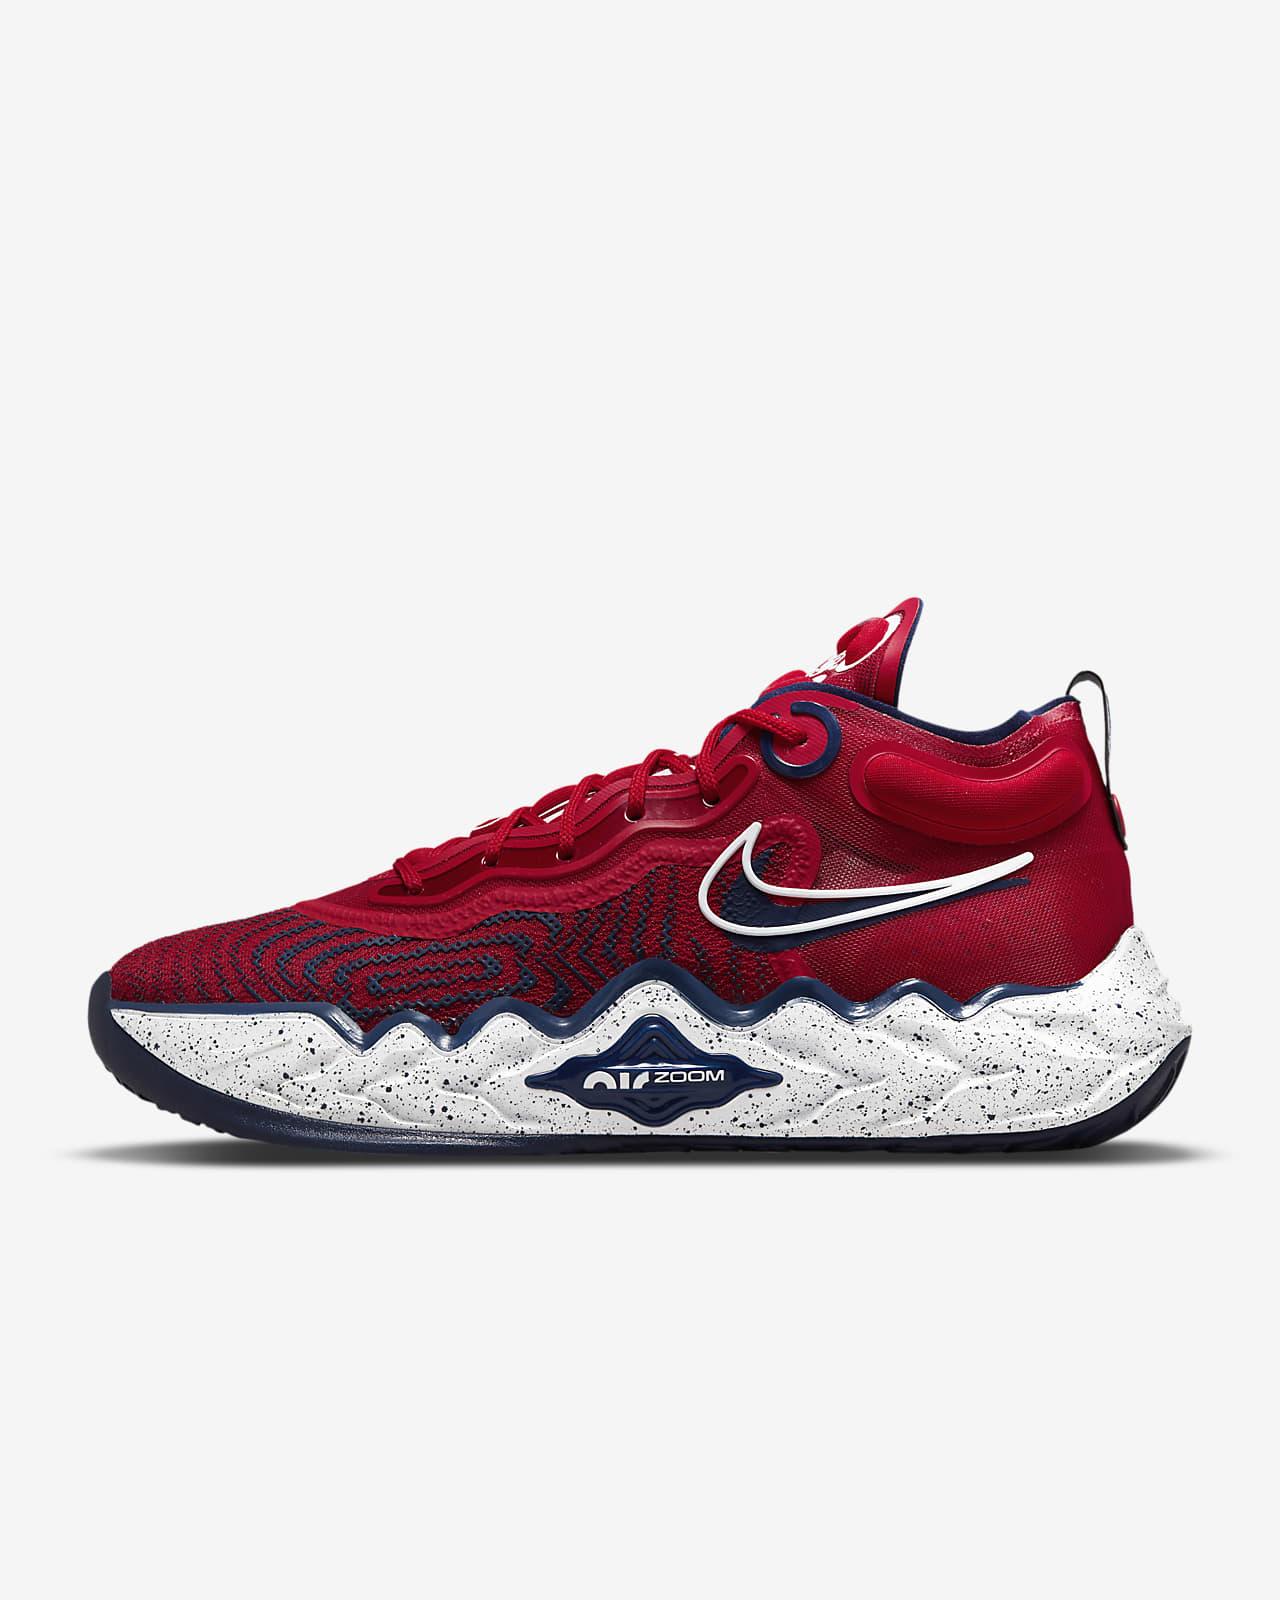 Calzado de básquetbol Nike Air Zoom G.T.Run